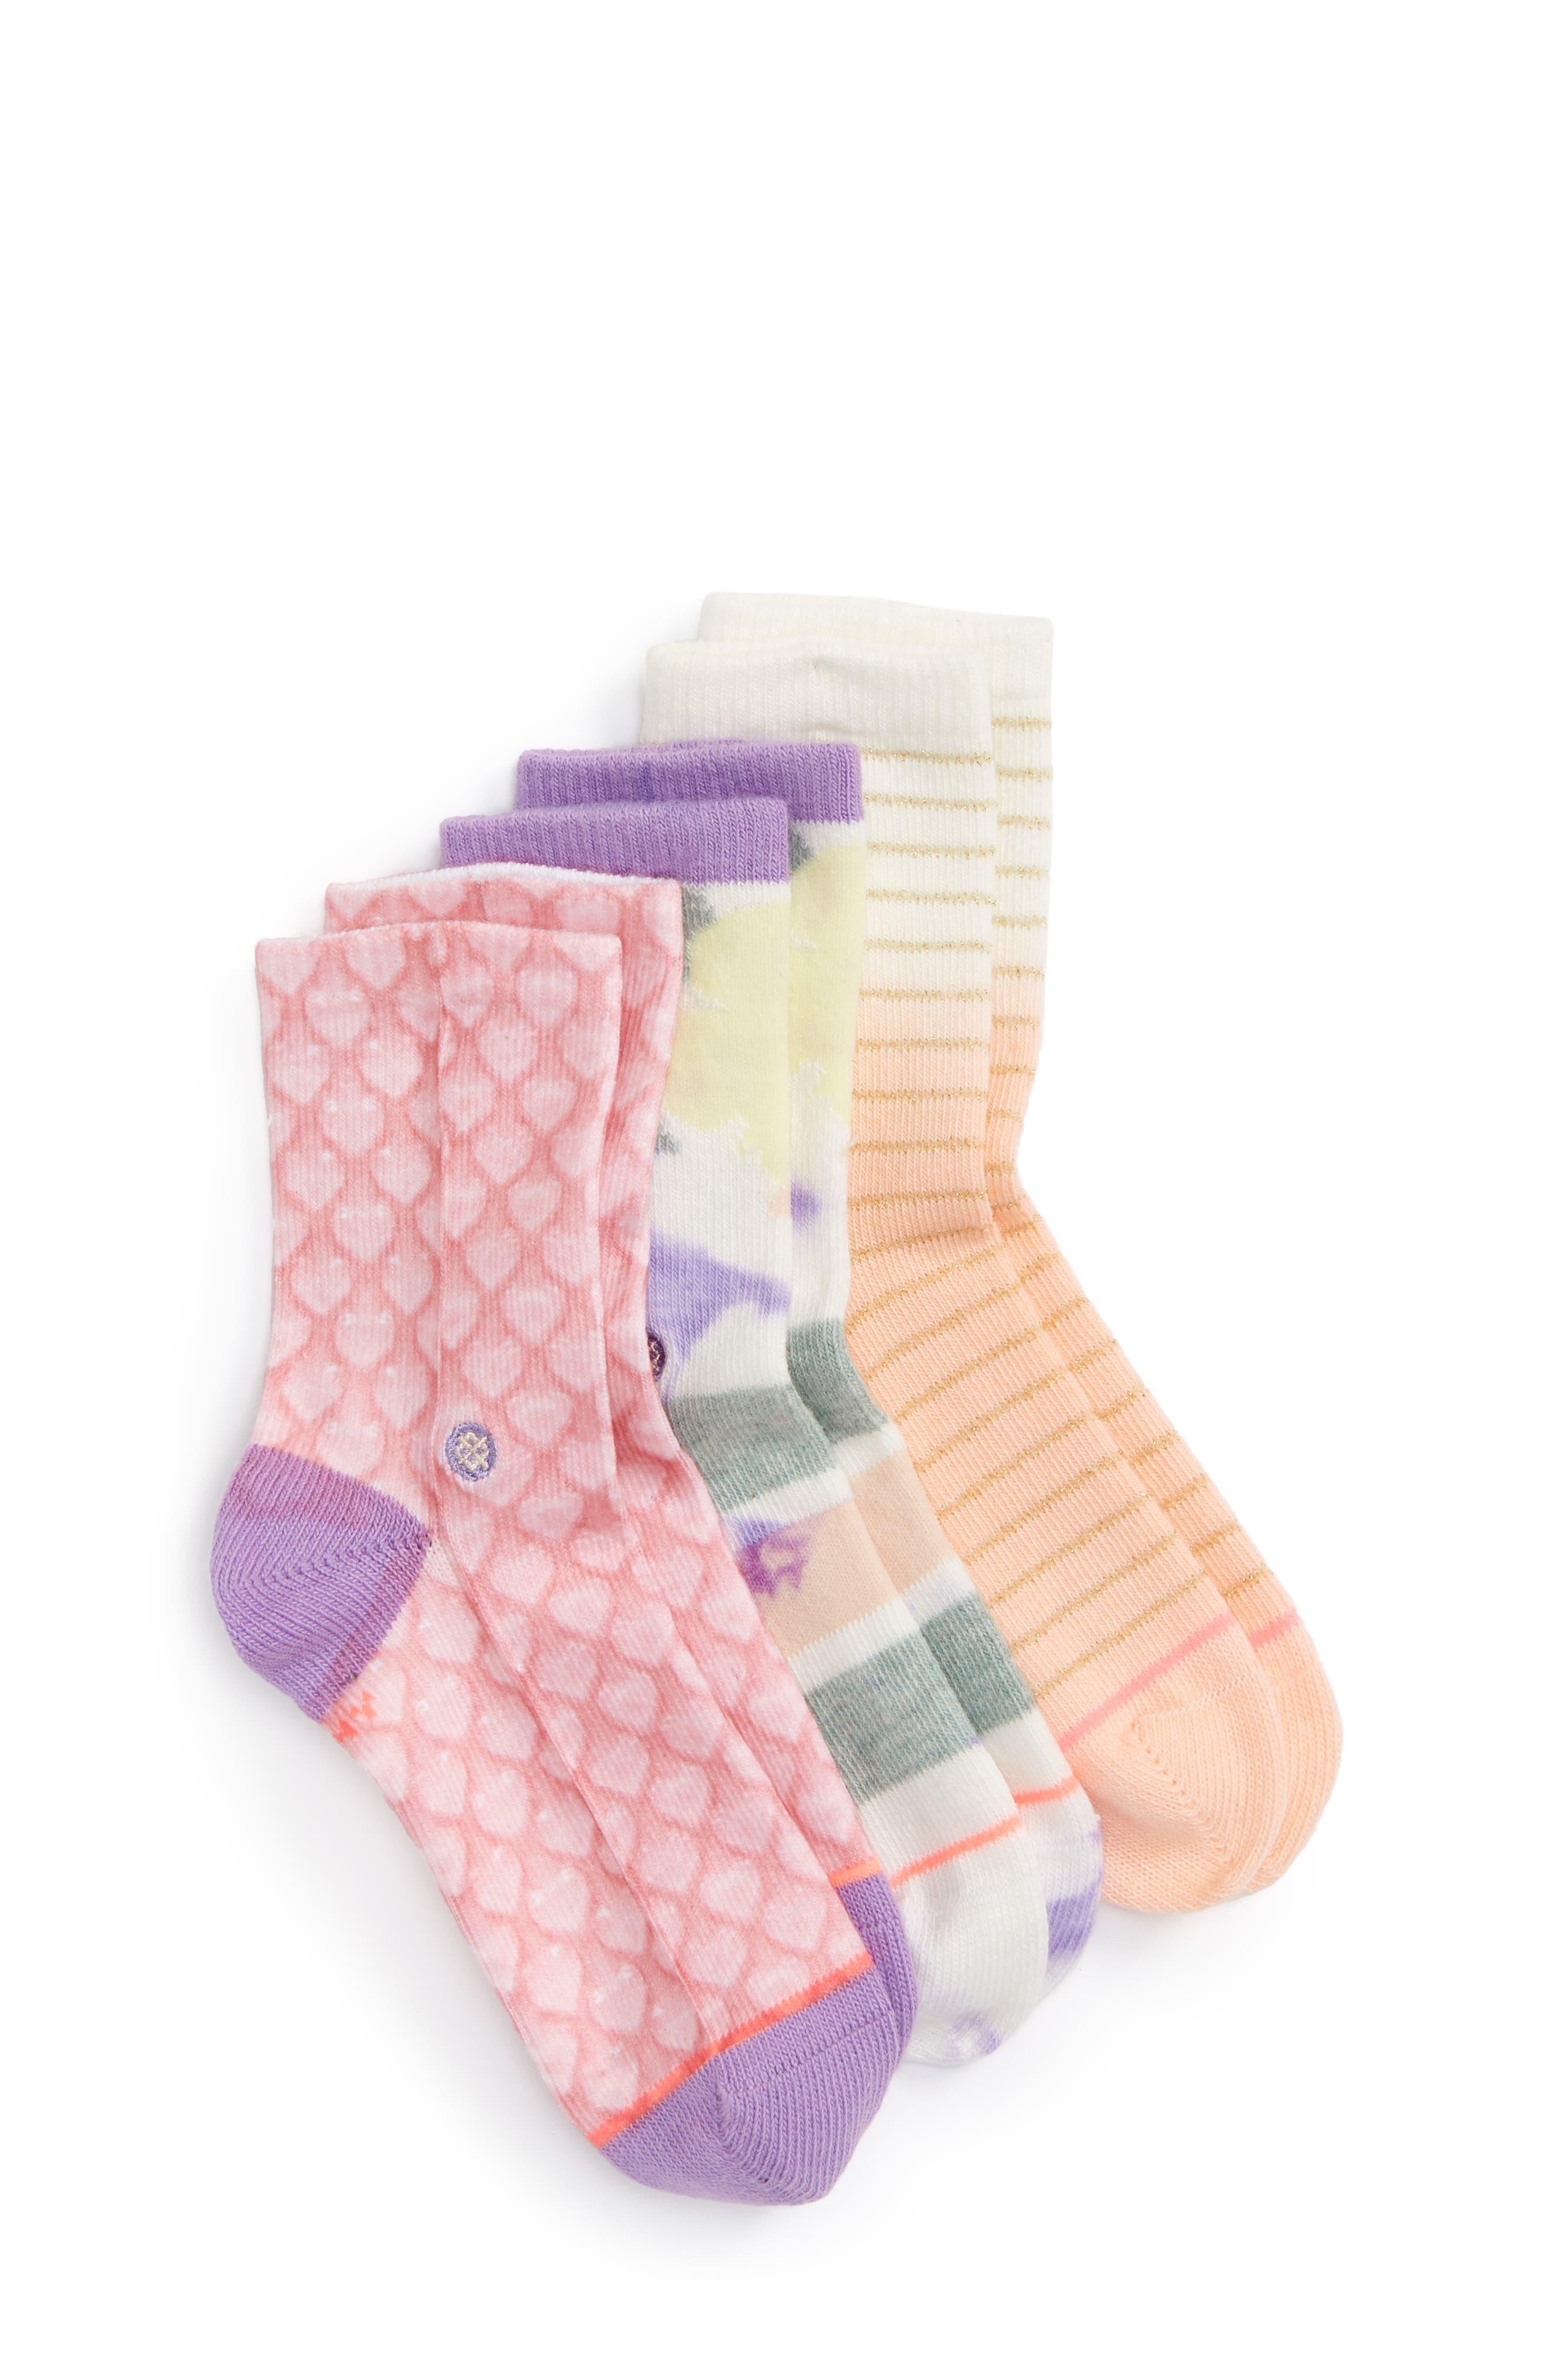 Main Image - Stance Pop Assorted 3-Pack Socks (Toddler)